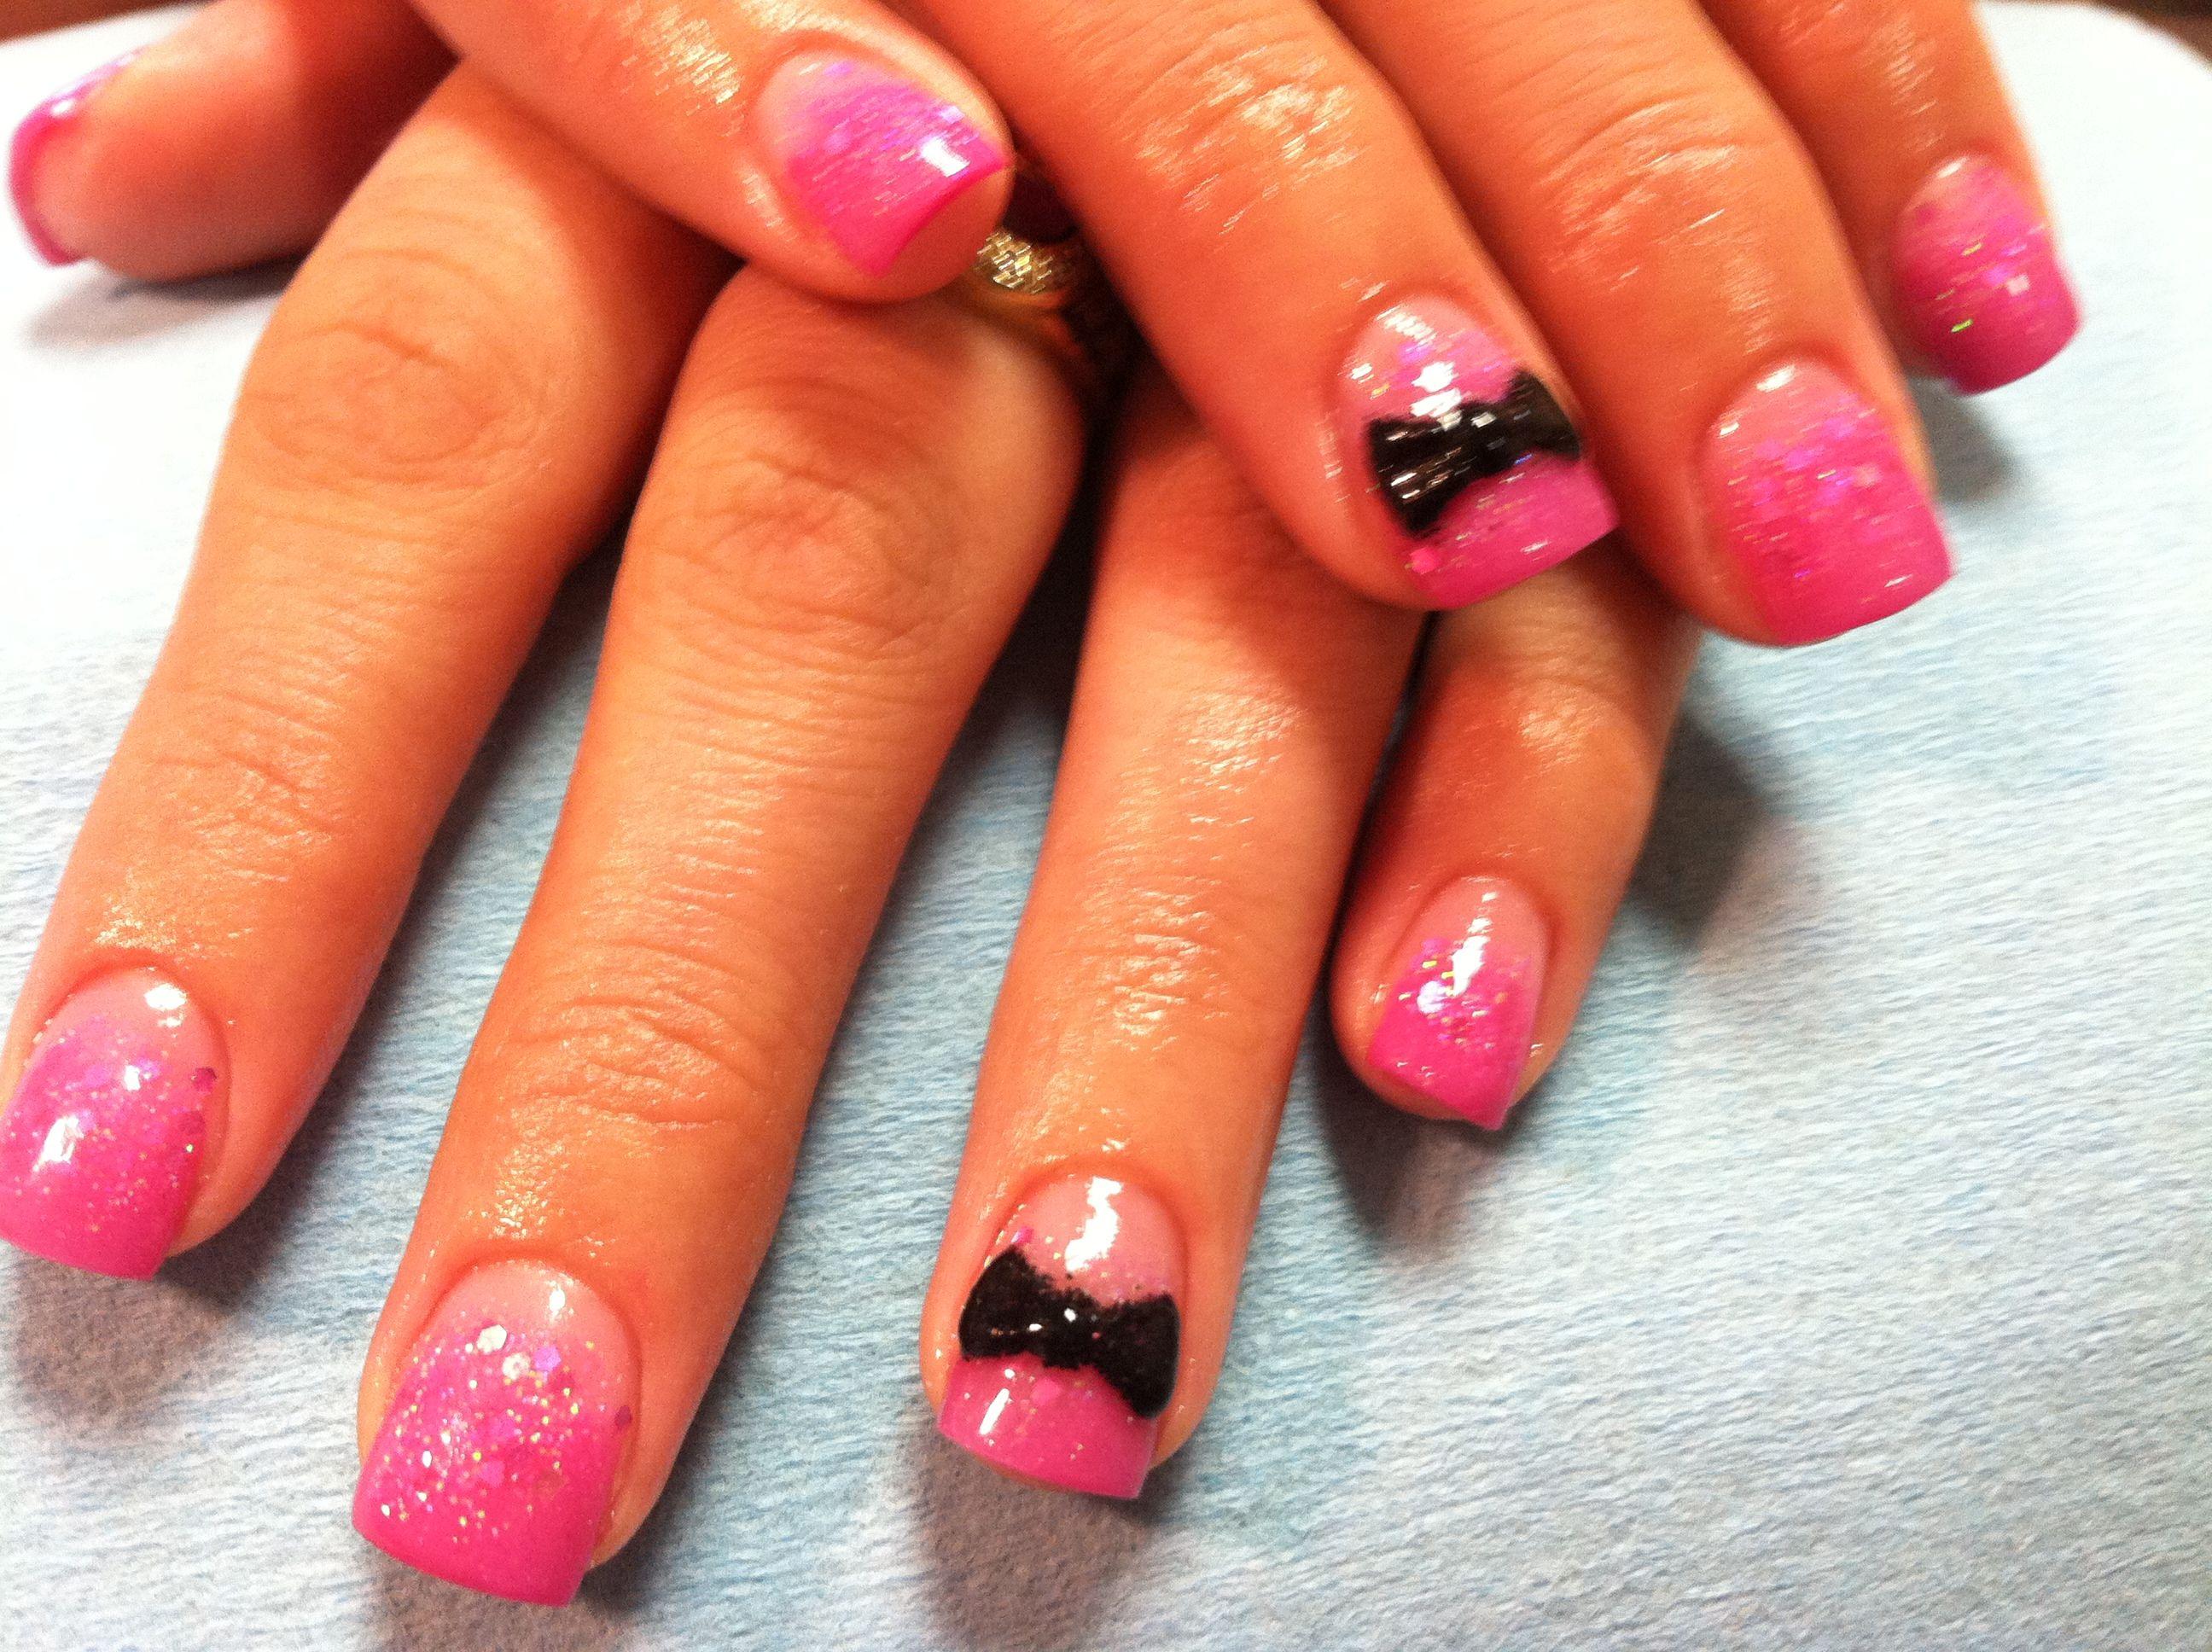 Acrylic nails bows pink glitter | My acrylic nails | Pinterest